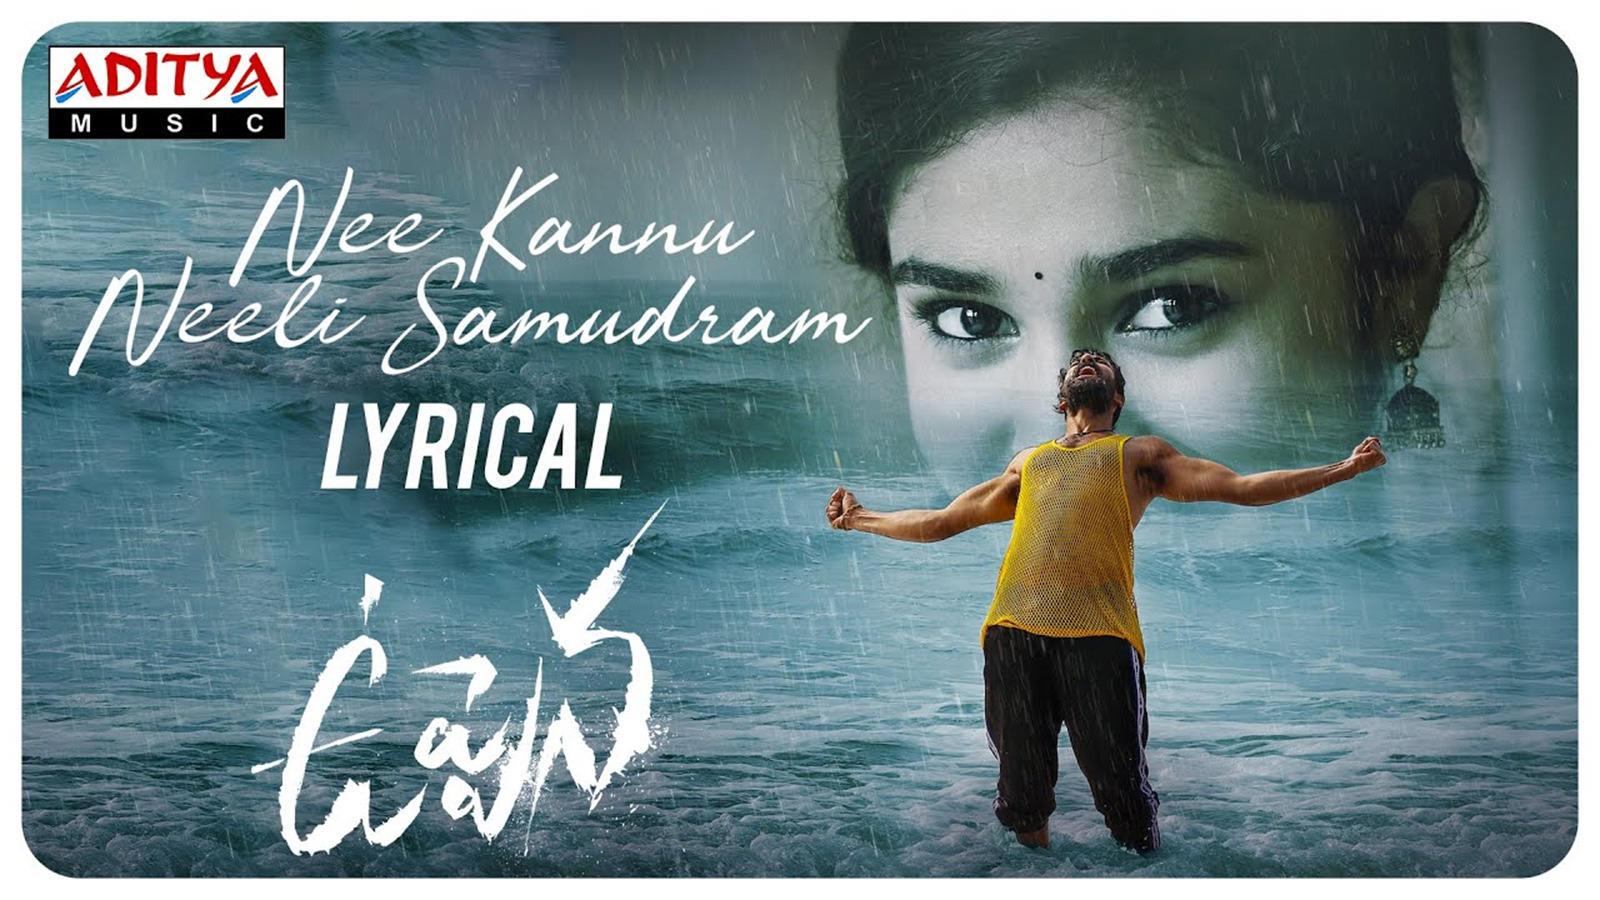 Telugu Song 2020 Latest Telugu Video Song Nee Kannu Neeli Samudram From Uppena Ft Panja Vaisshnav Tej And Krithi Shetty Lyrical Telugu Video Songs Times Of India